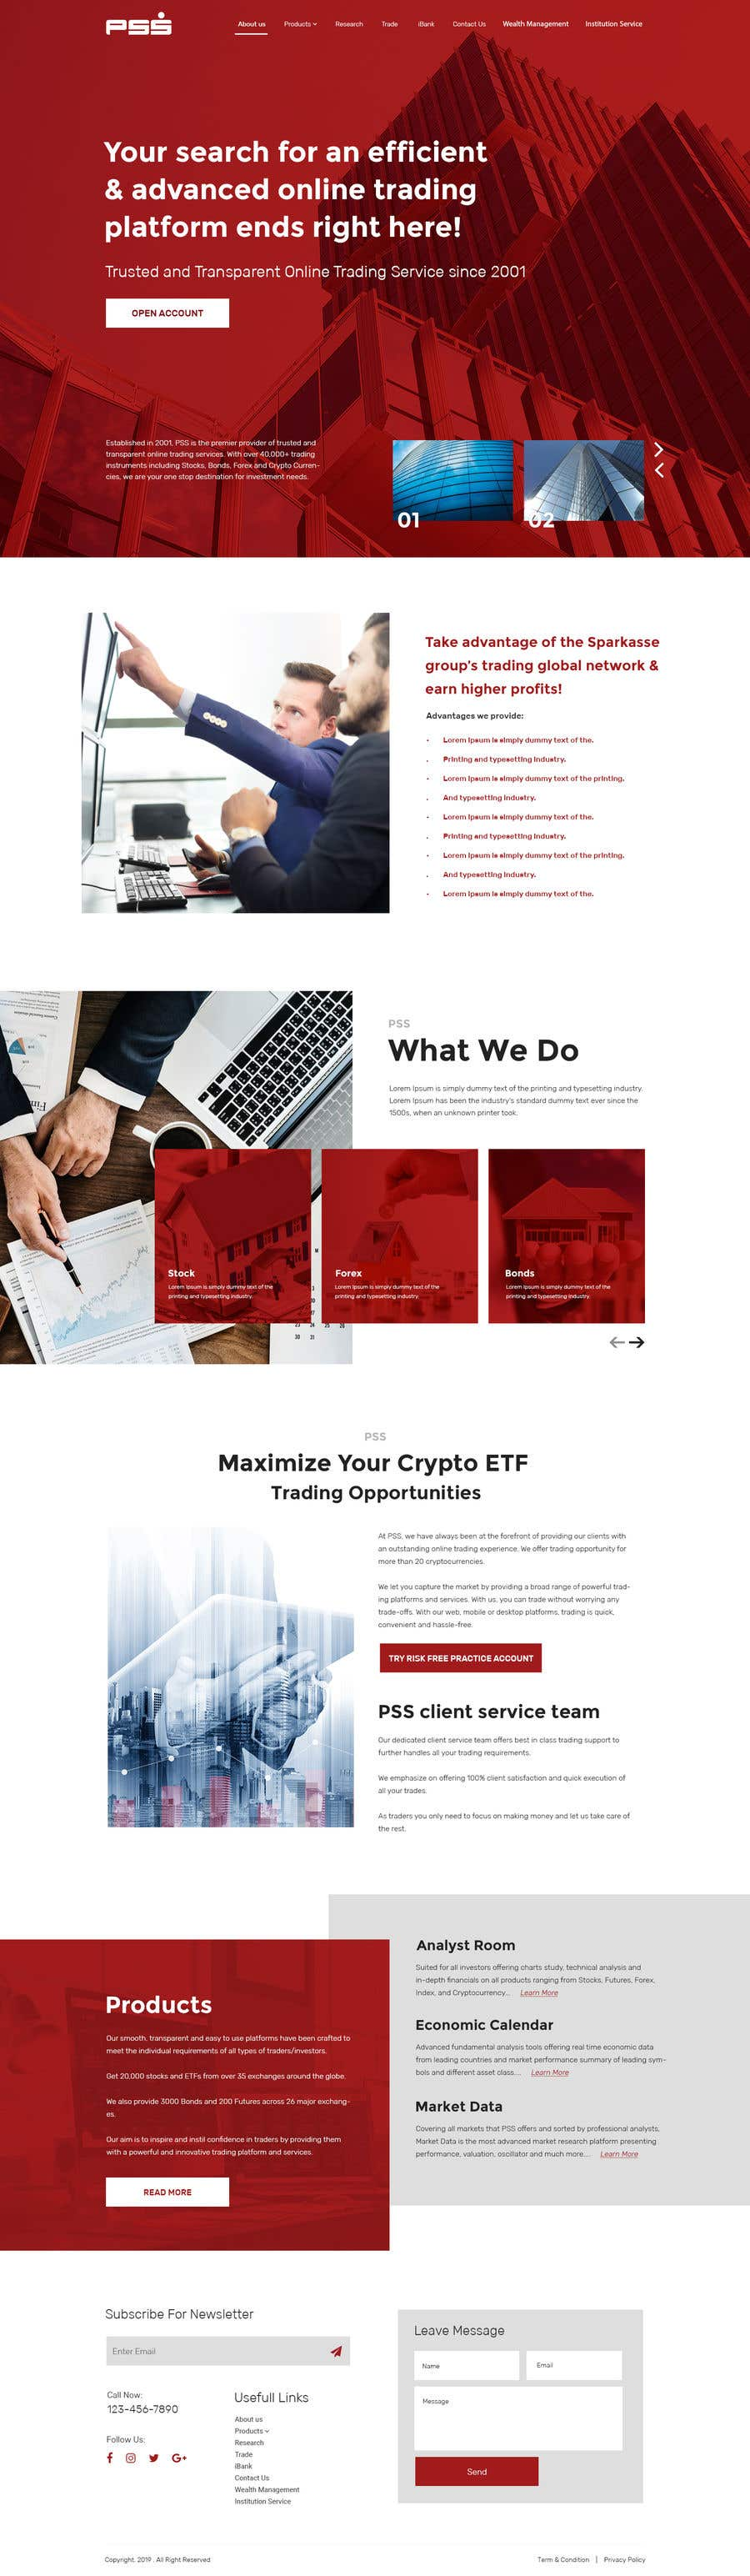 "Intrarea #10 pentru concursul ""Home page design for existing site"""